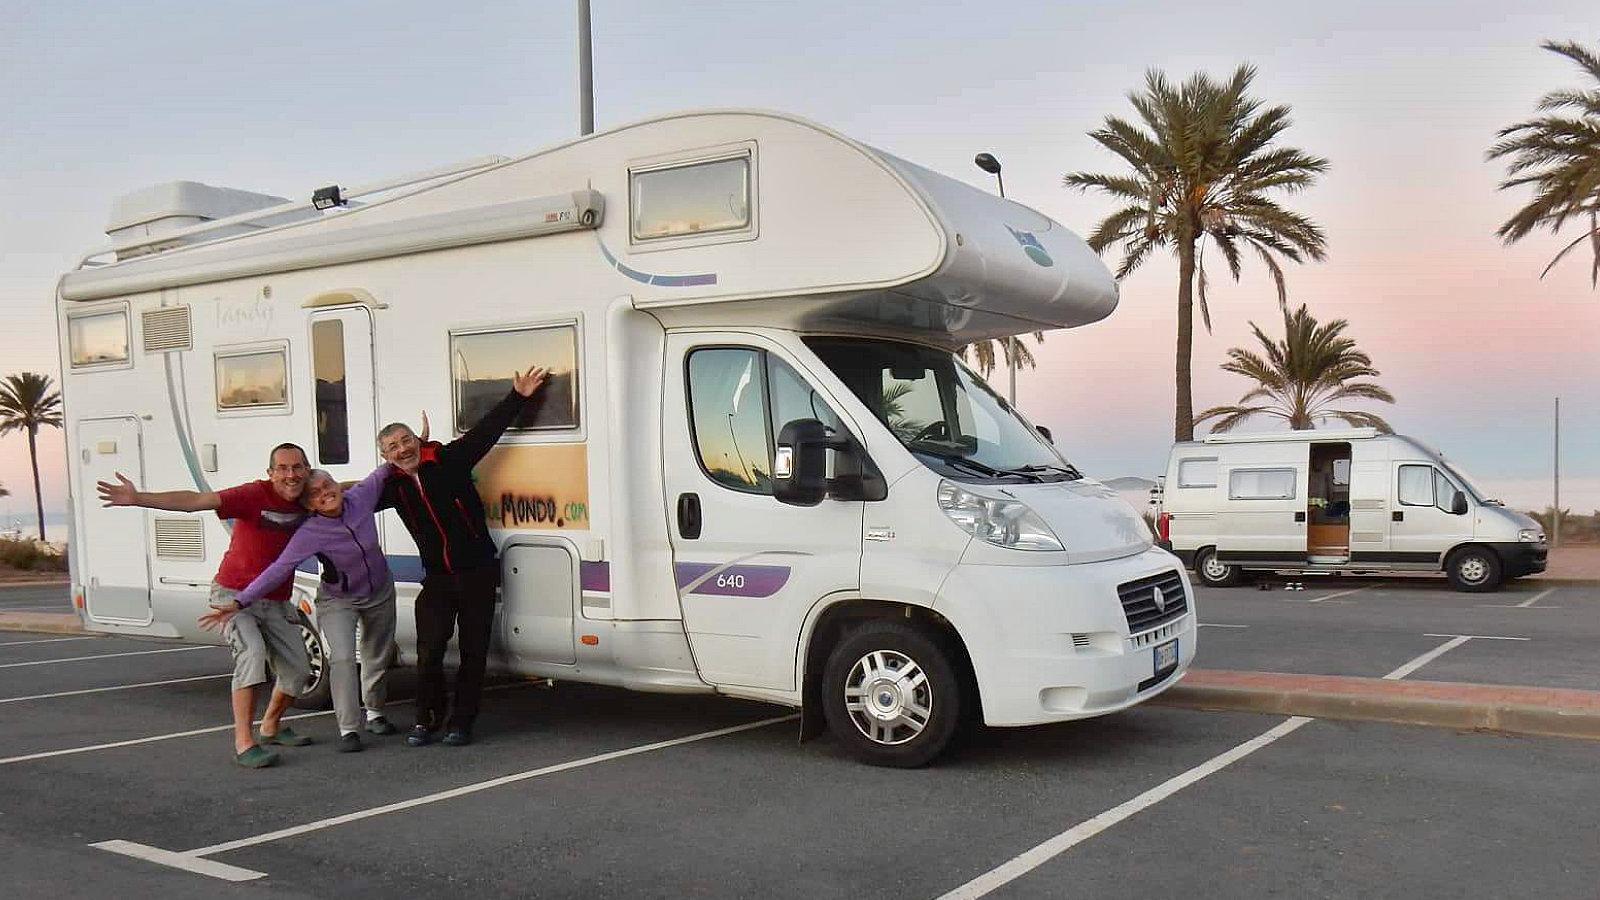 Roldano Marzorati Camper Mclouis Saluti Featured